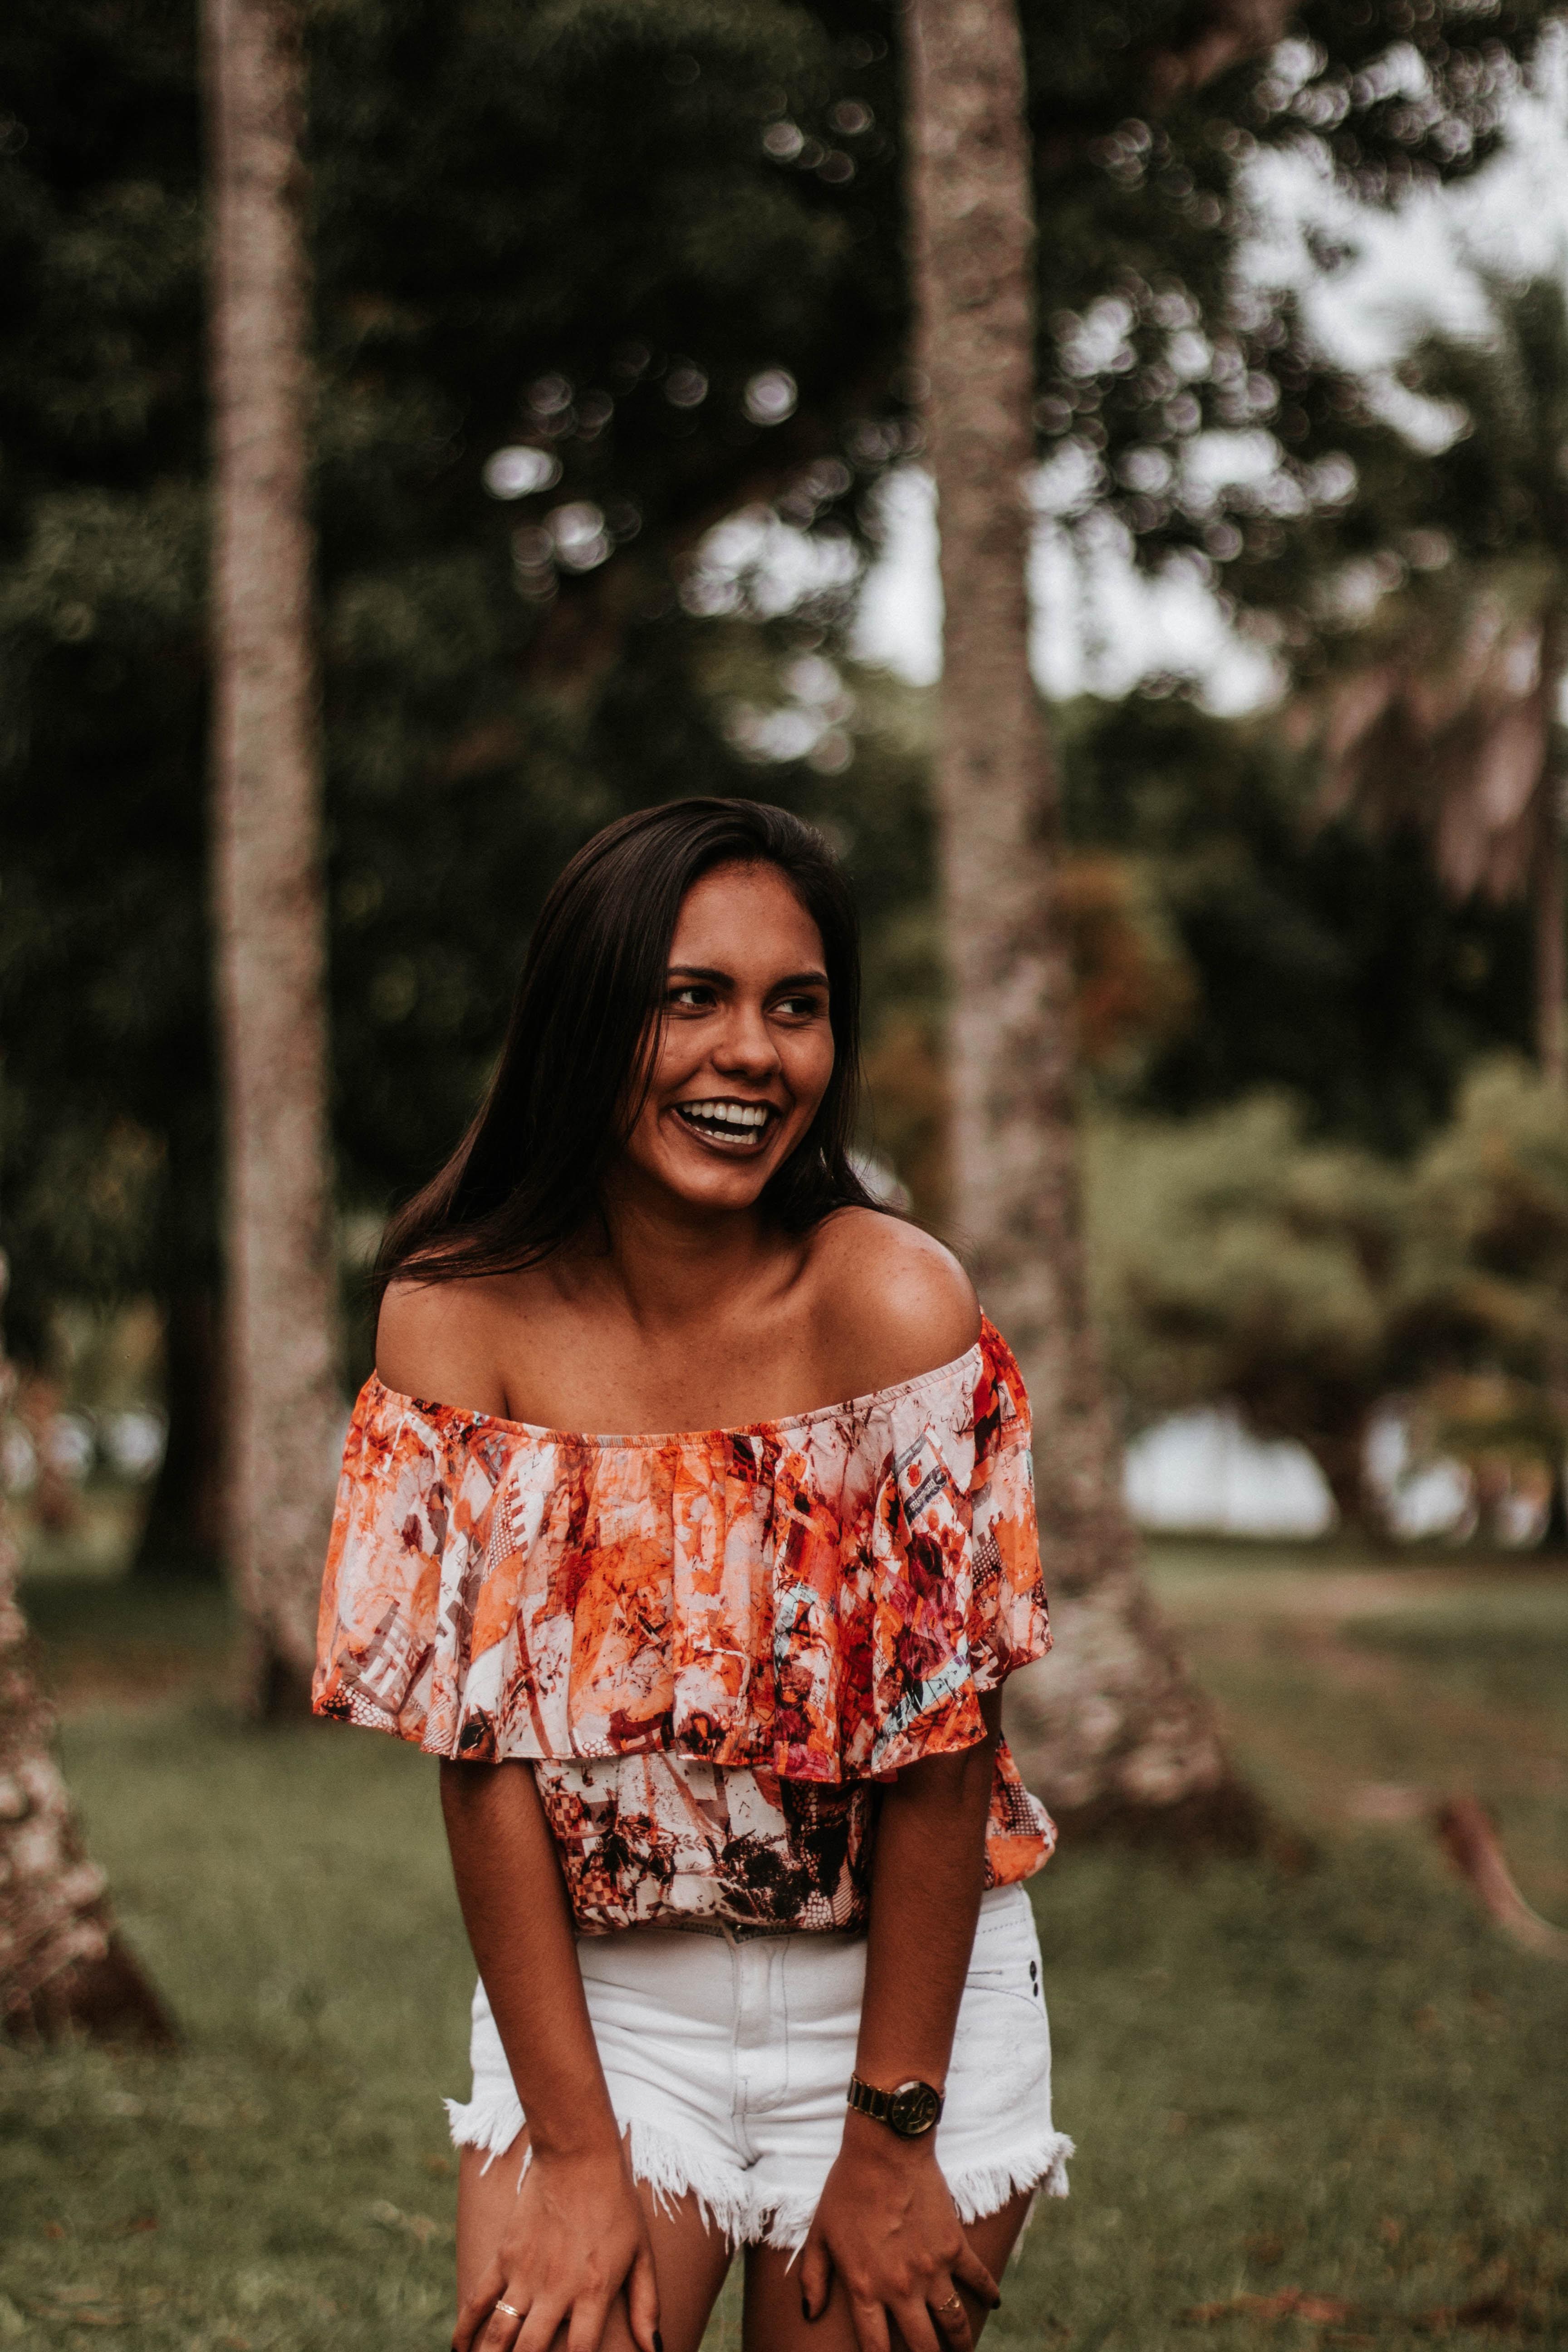 woman in orange off-shoulder dress laughing beside trees